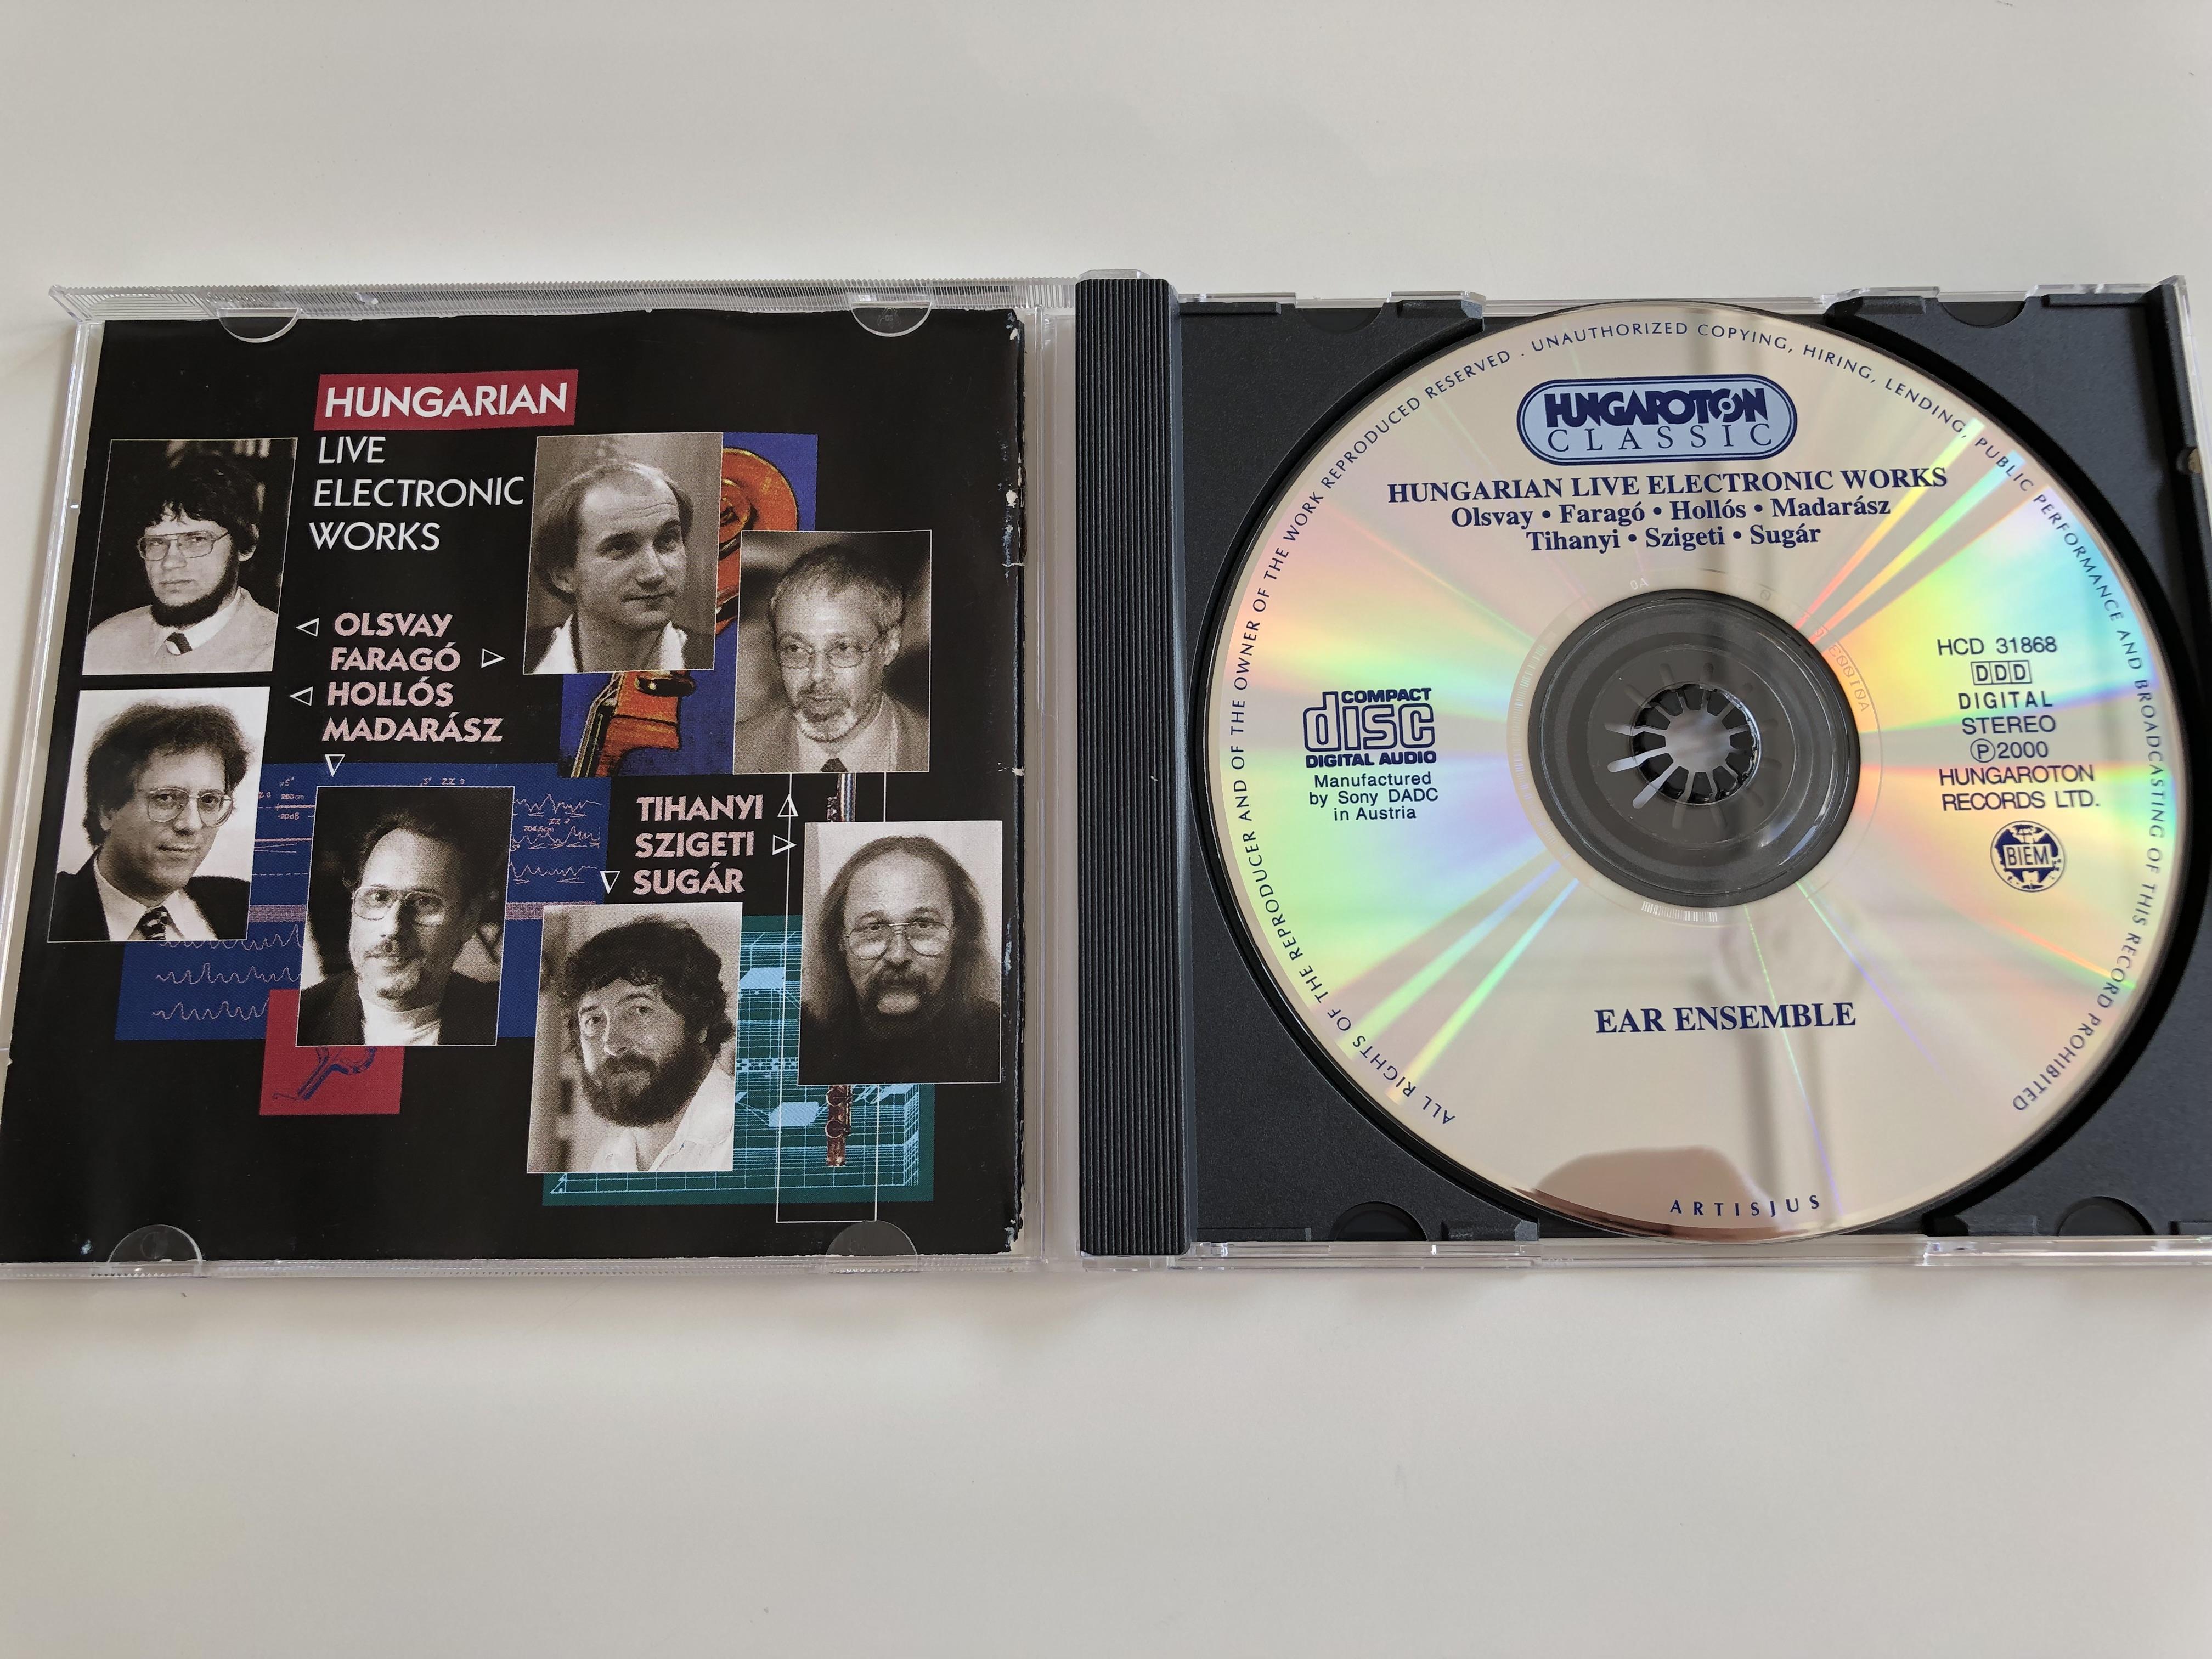 hungarian-live-electronic-works-olsvay-farag-holl-s-madar-sz-tihanyi-szigeti-sug-r-ear-ensemble-hungaroton-classic-audio-cd-2000-hcd-31868-7-.jpg